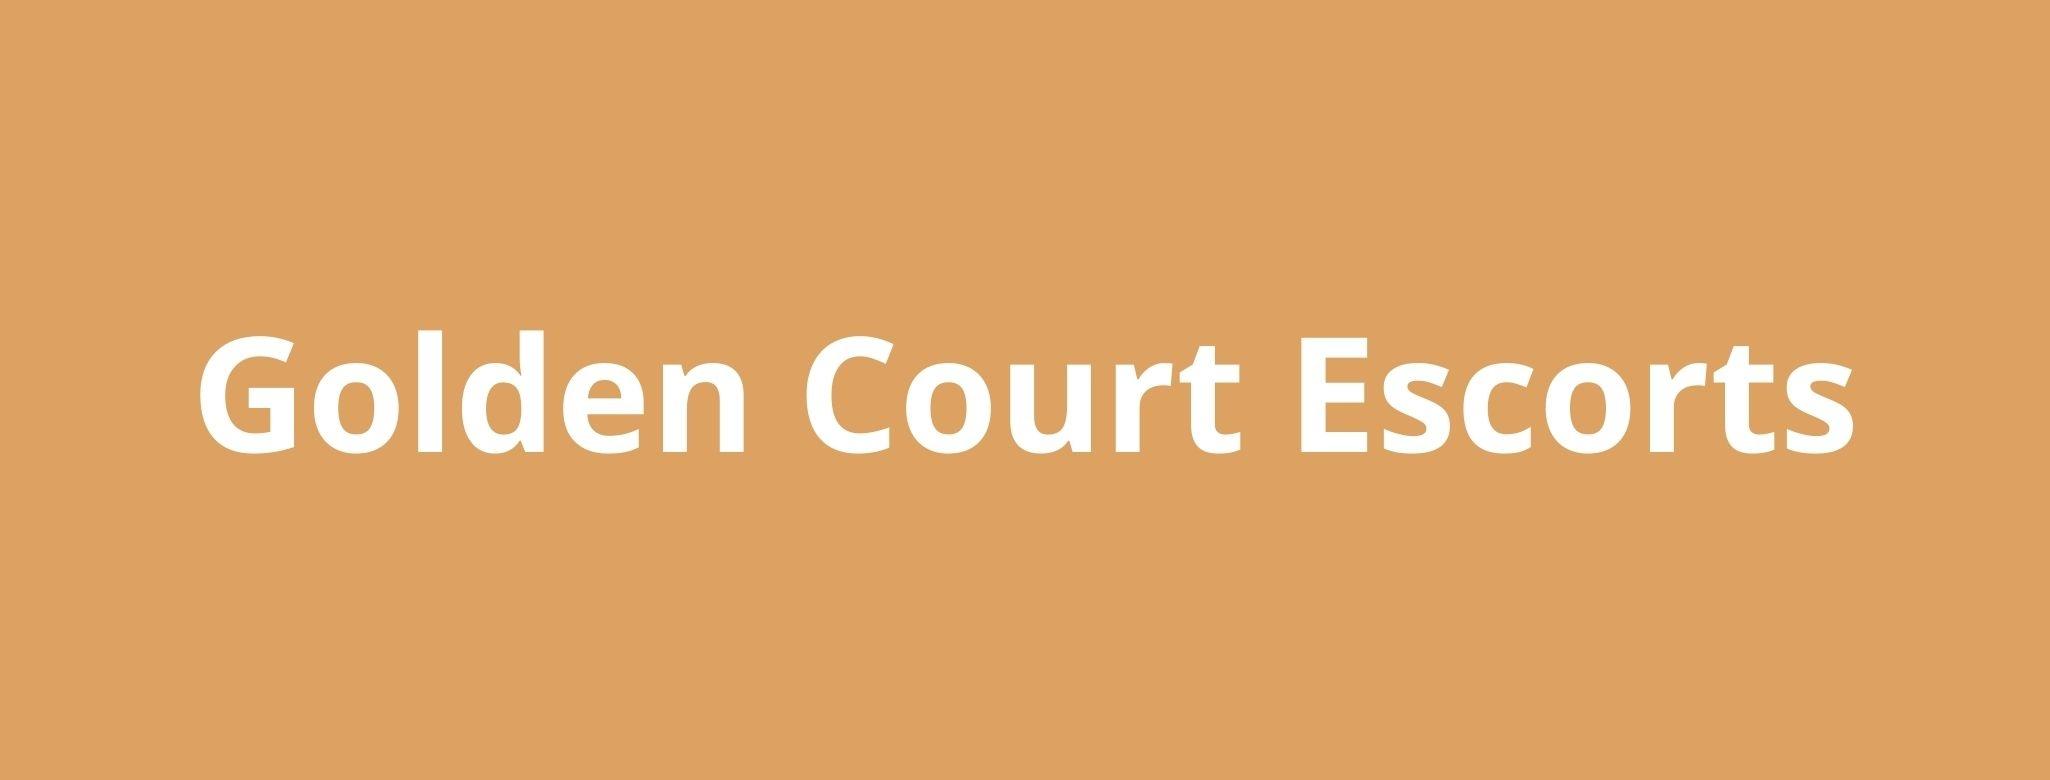 Golden Court Escorts (@goldencourtescorts) Cover Image